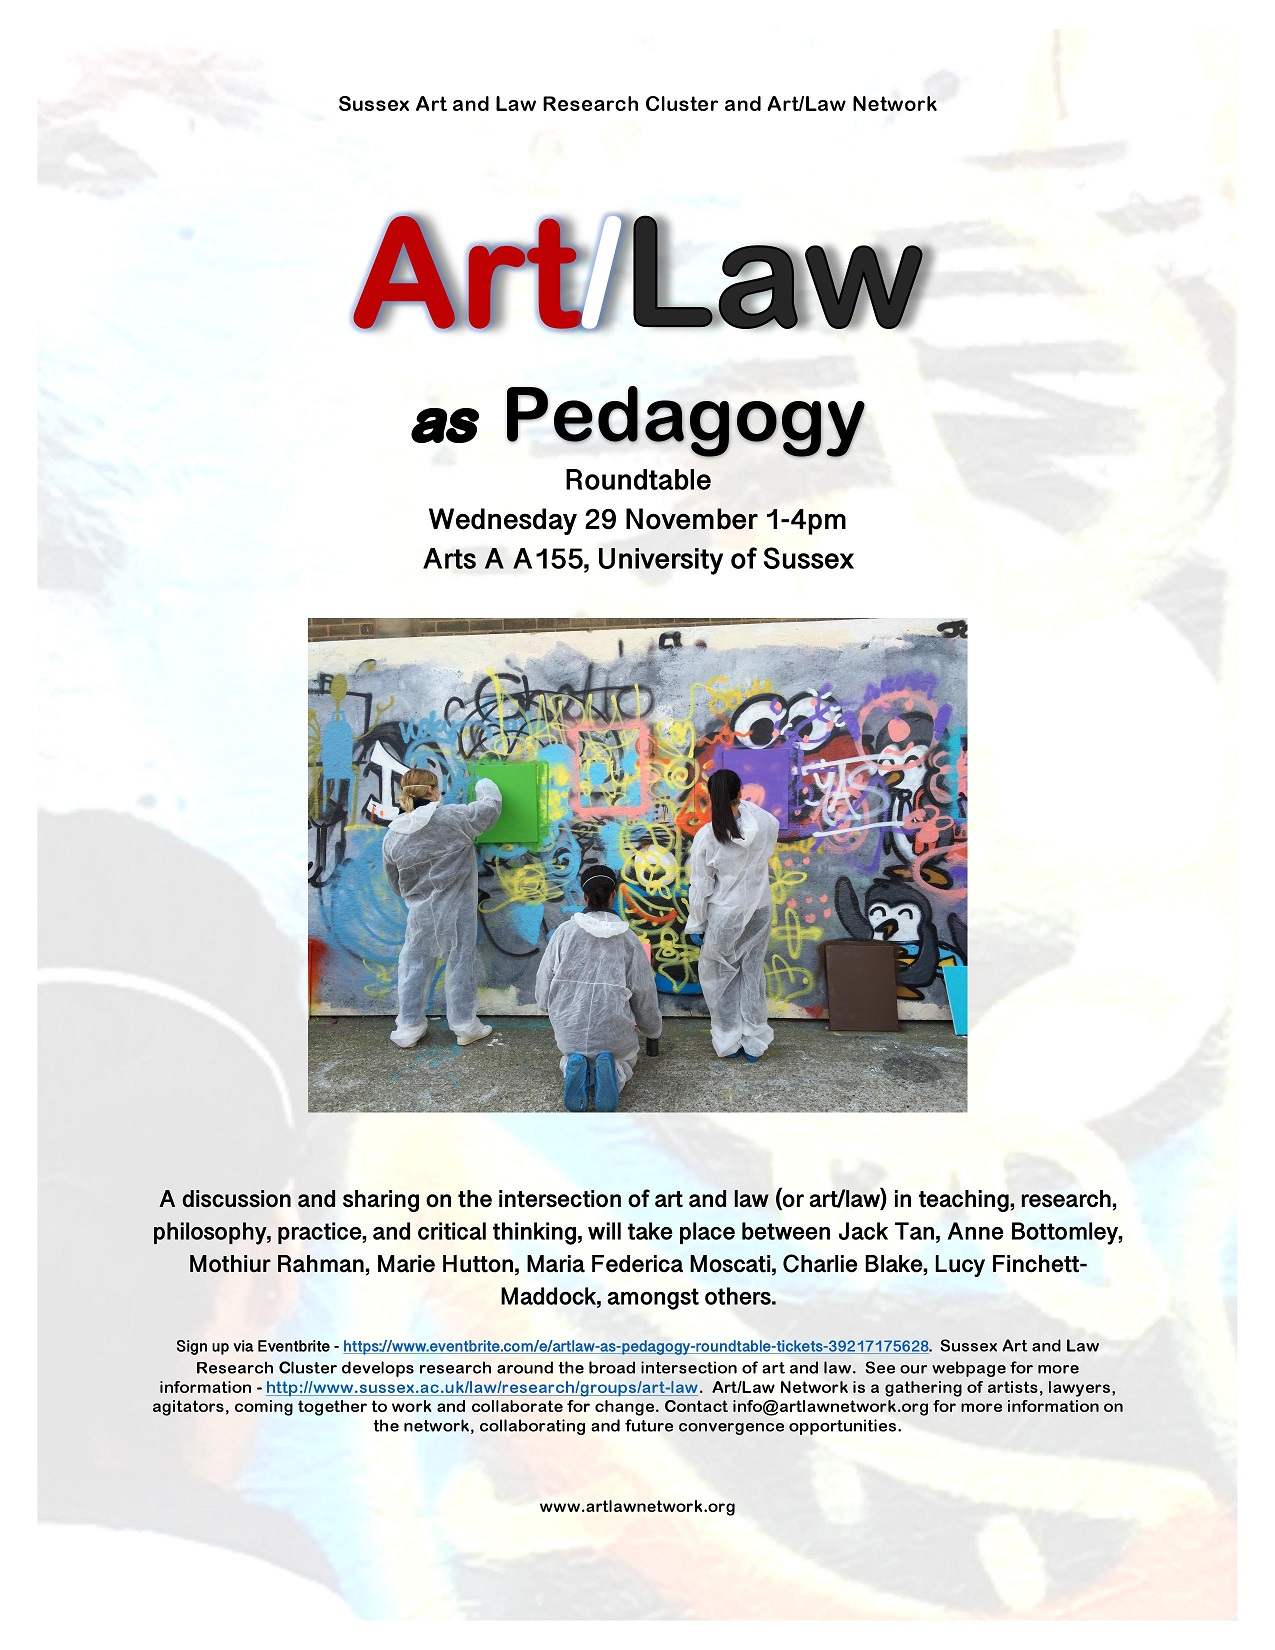 ArtLawPedagogy_sussexlawschool2